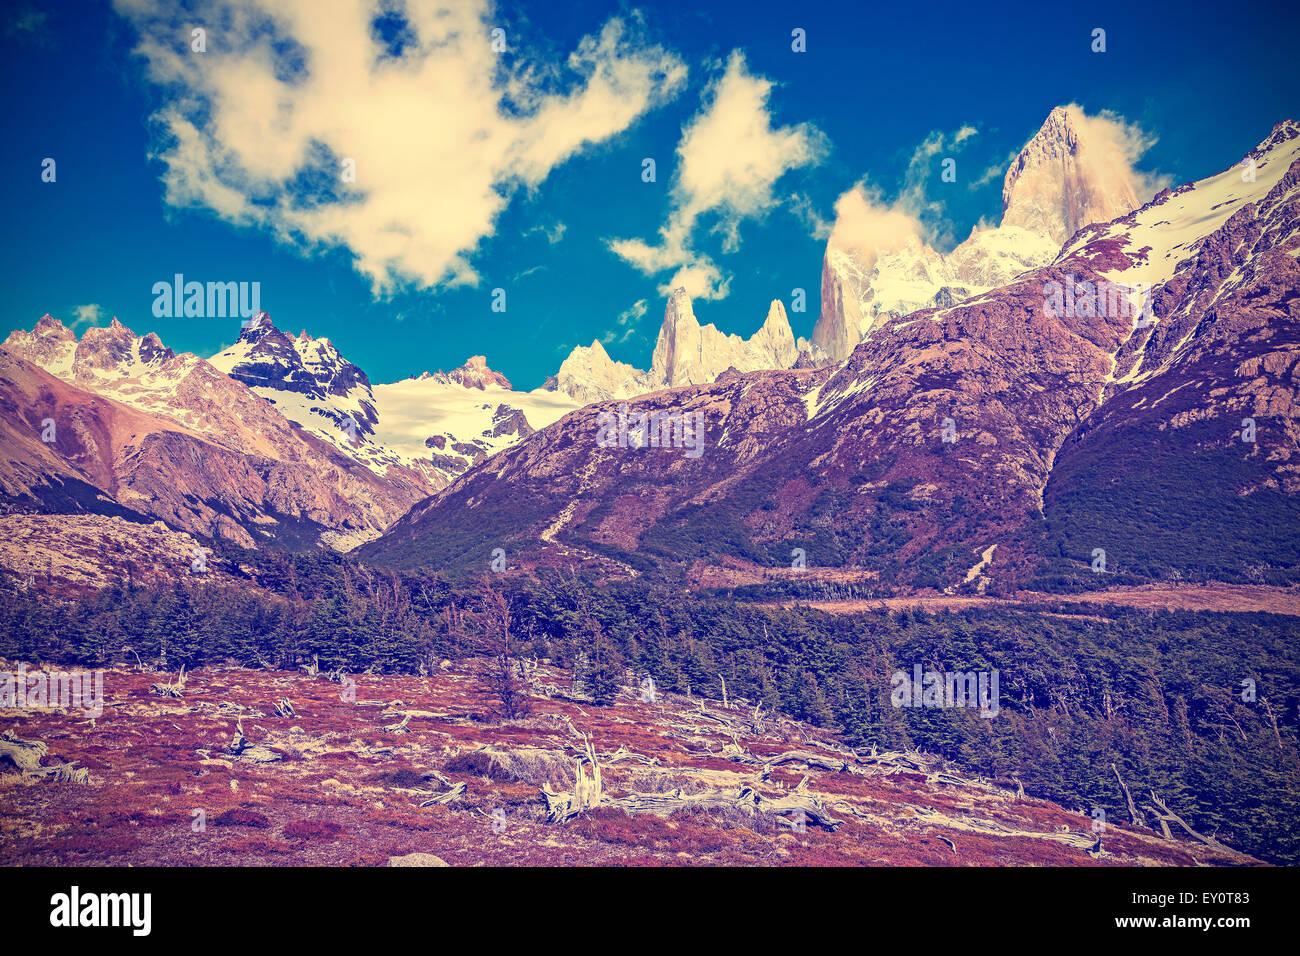 Vintage tonica Fitz Roy Mountain Range, Argentina. Immagini Stock